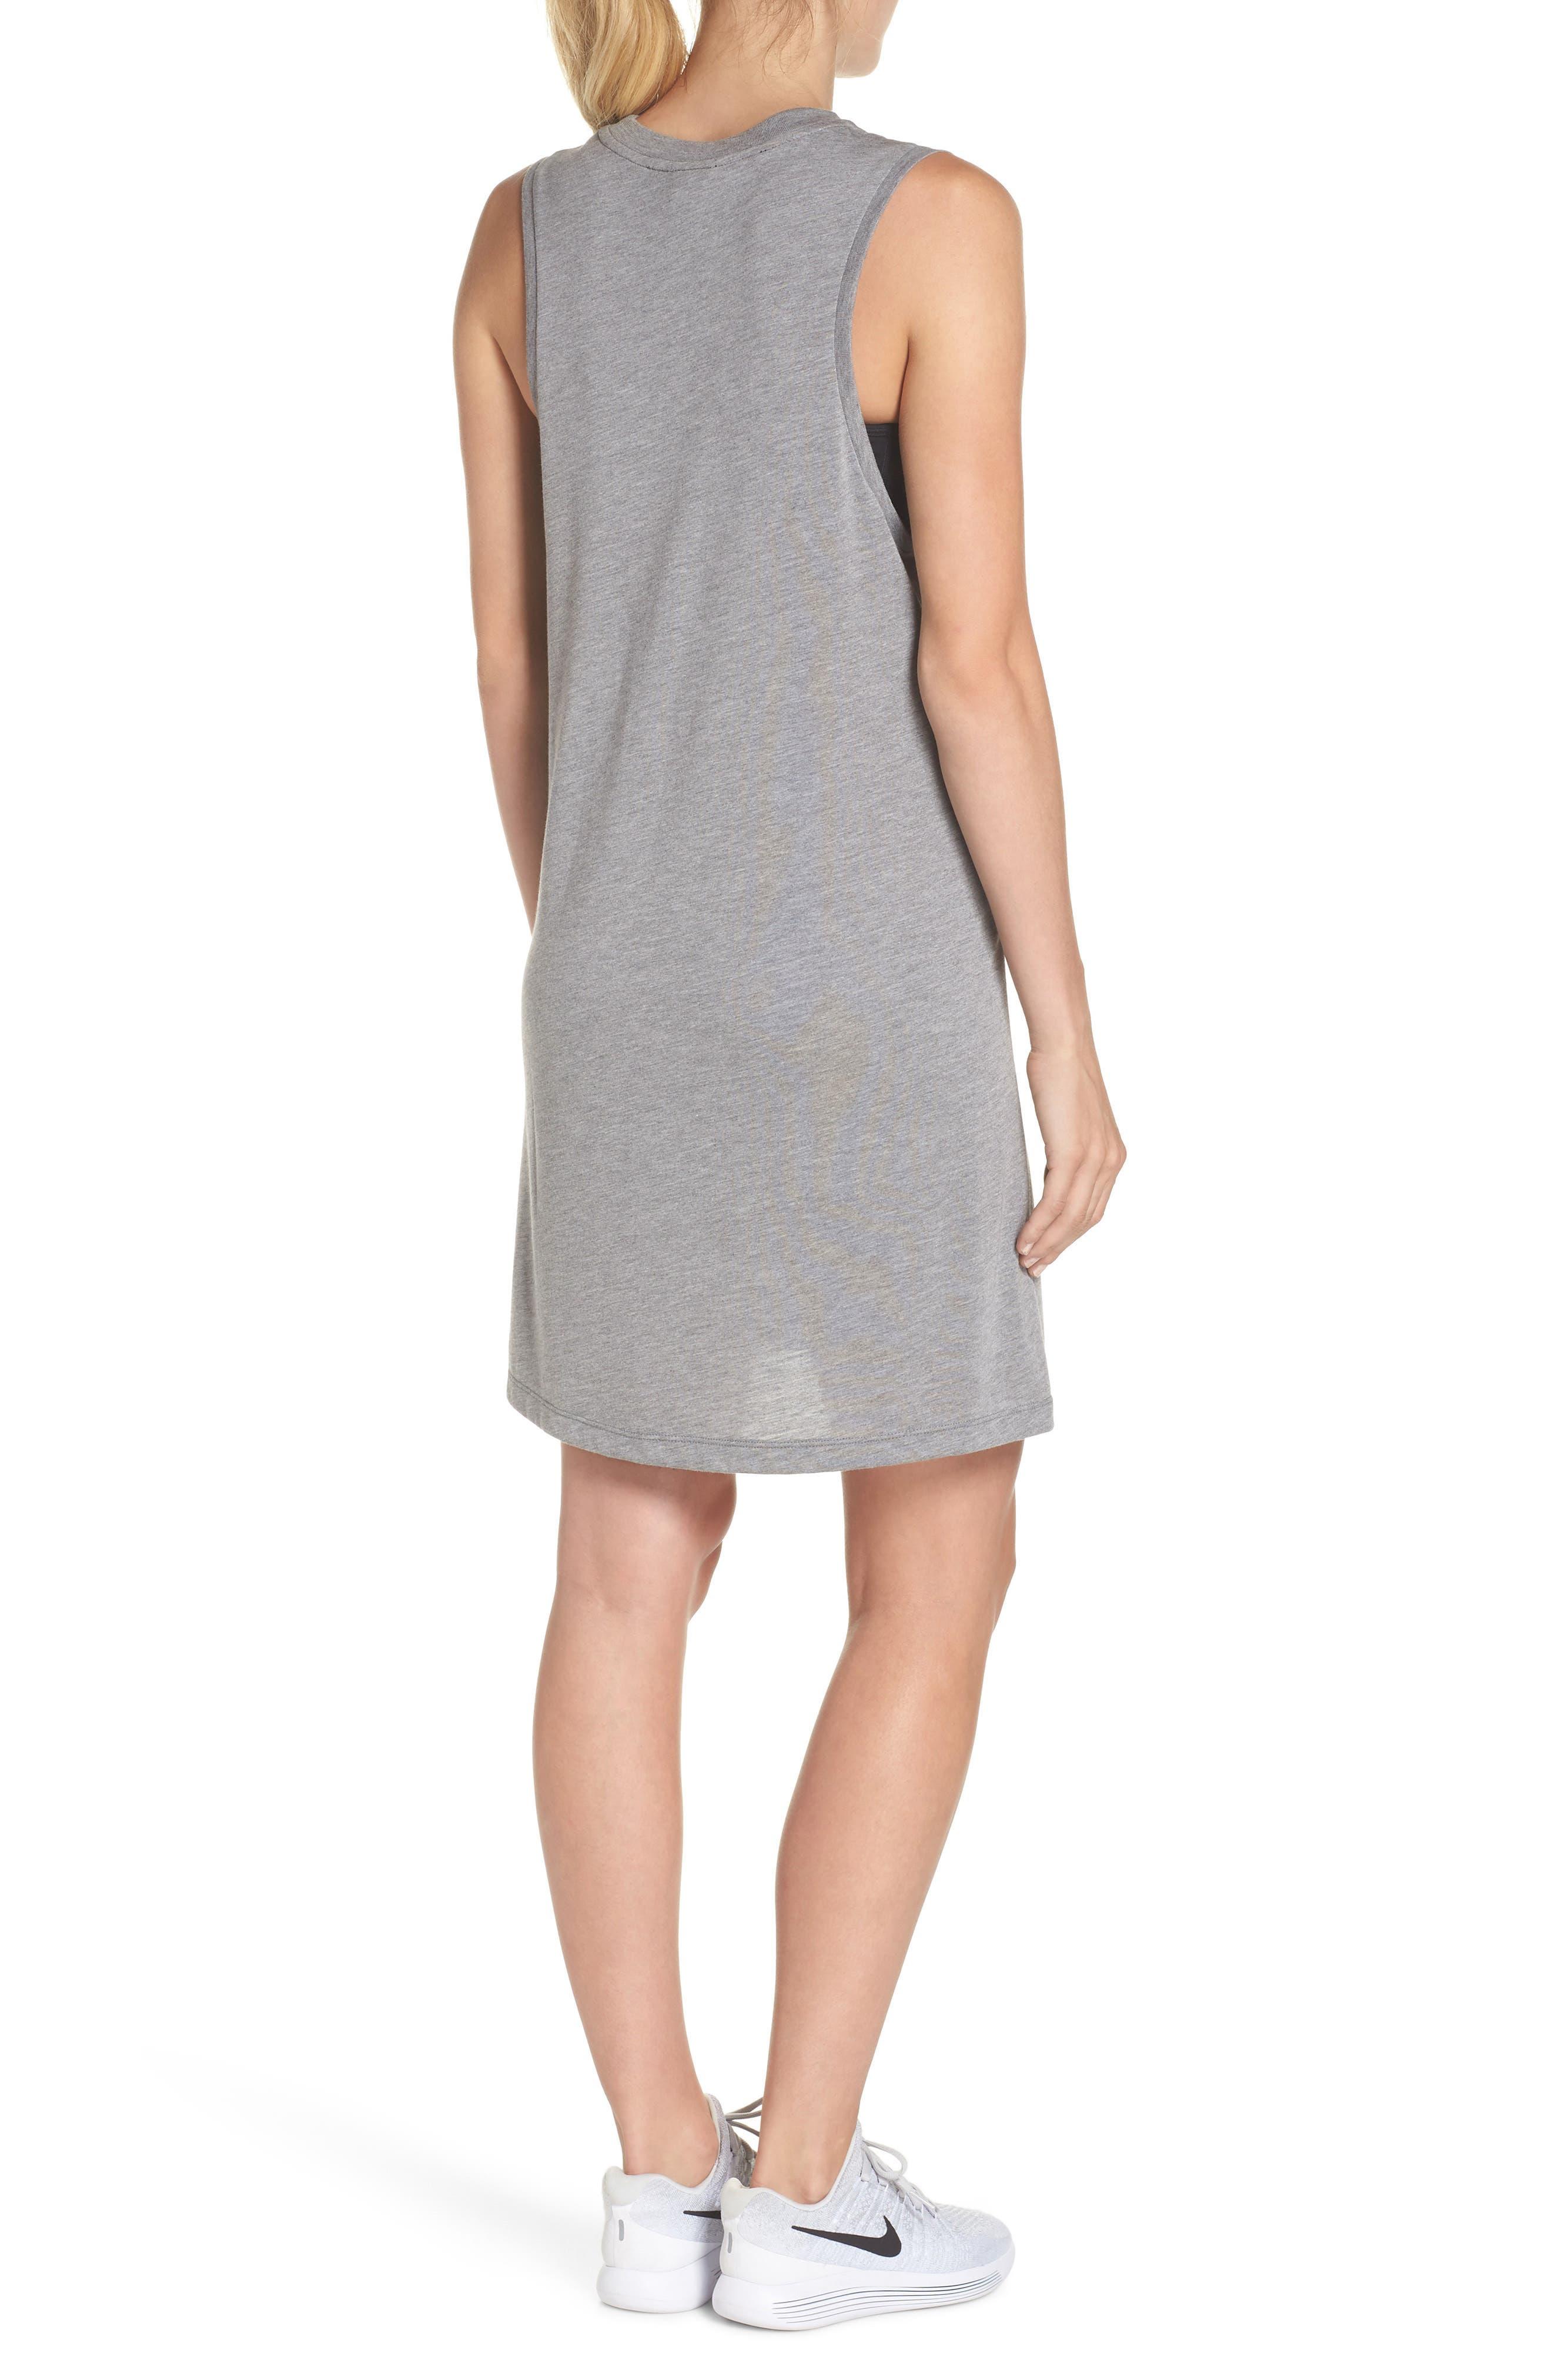 Sportswear Sleeveless Dress,                             Alternate thumbnail 4, color,